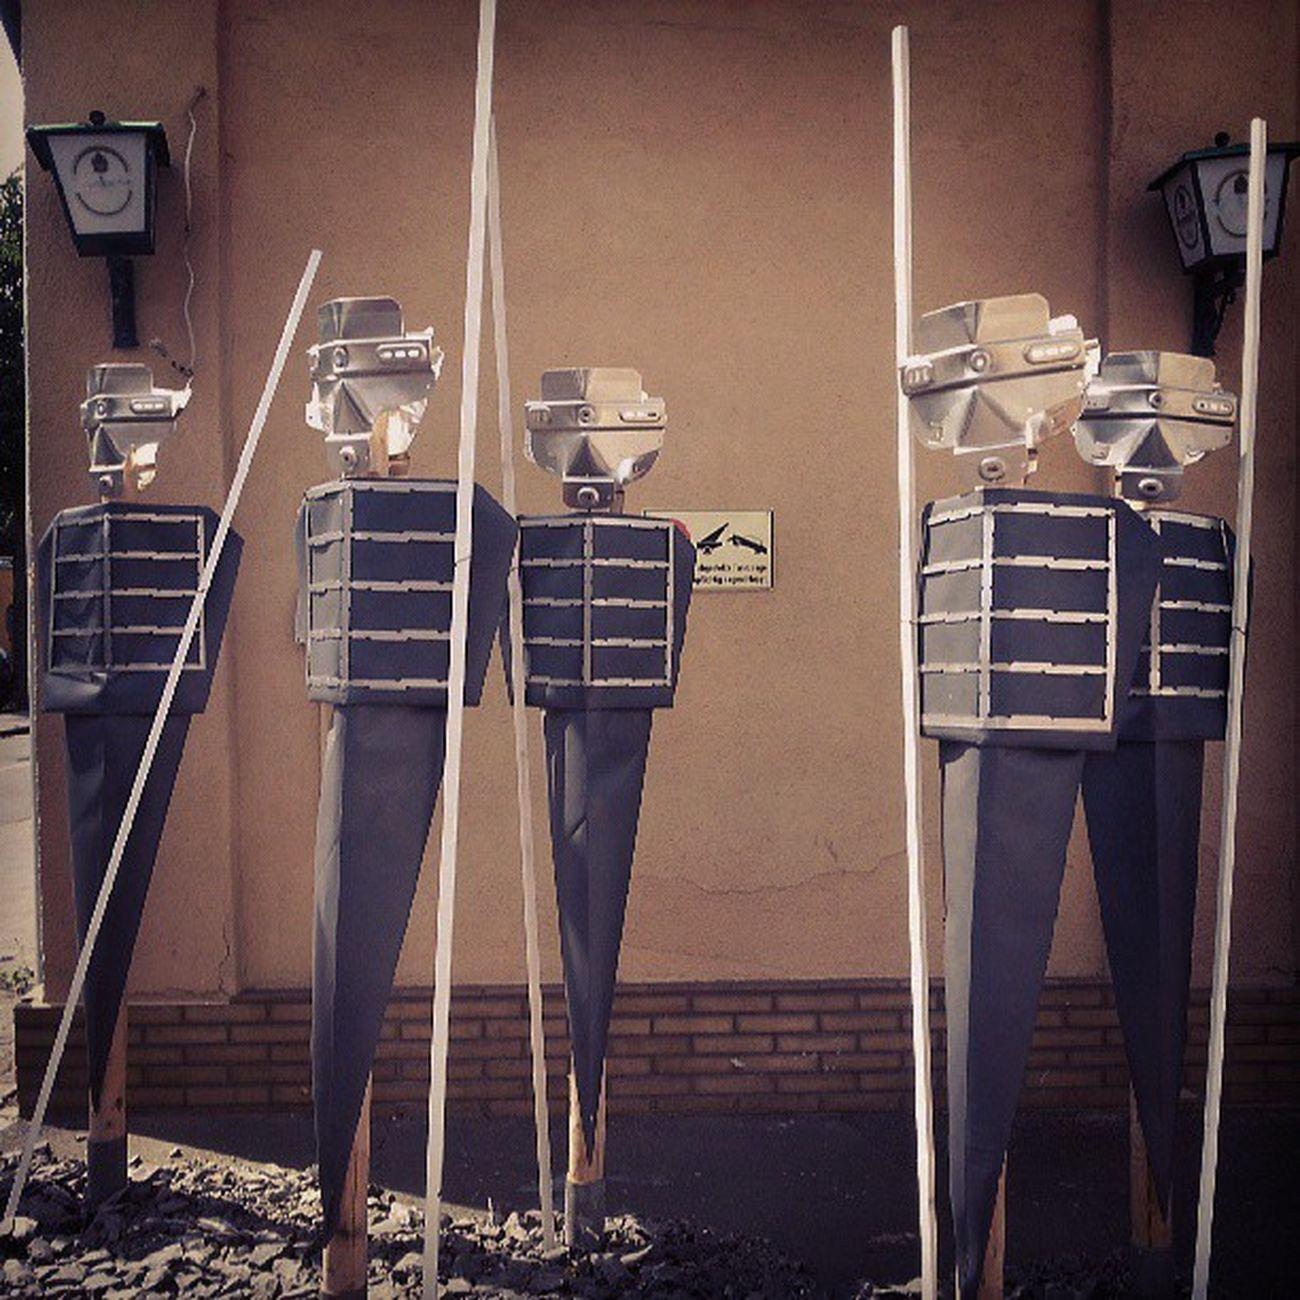 Soldaten oder Ritter oder so... Kunst halt